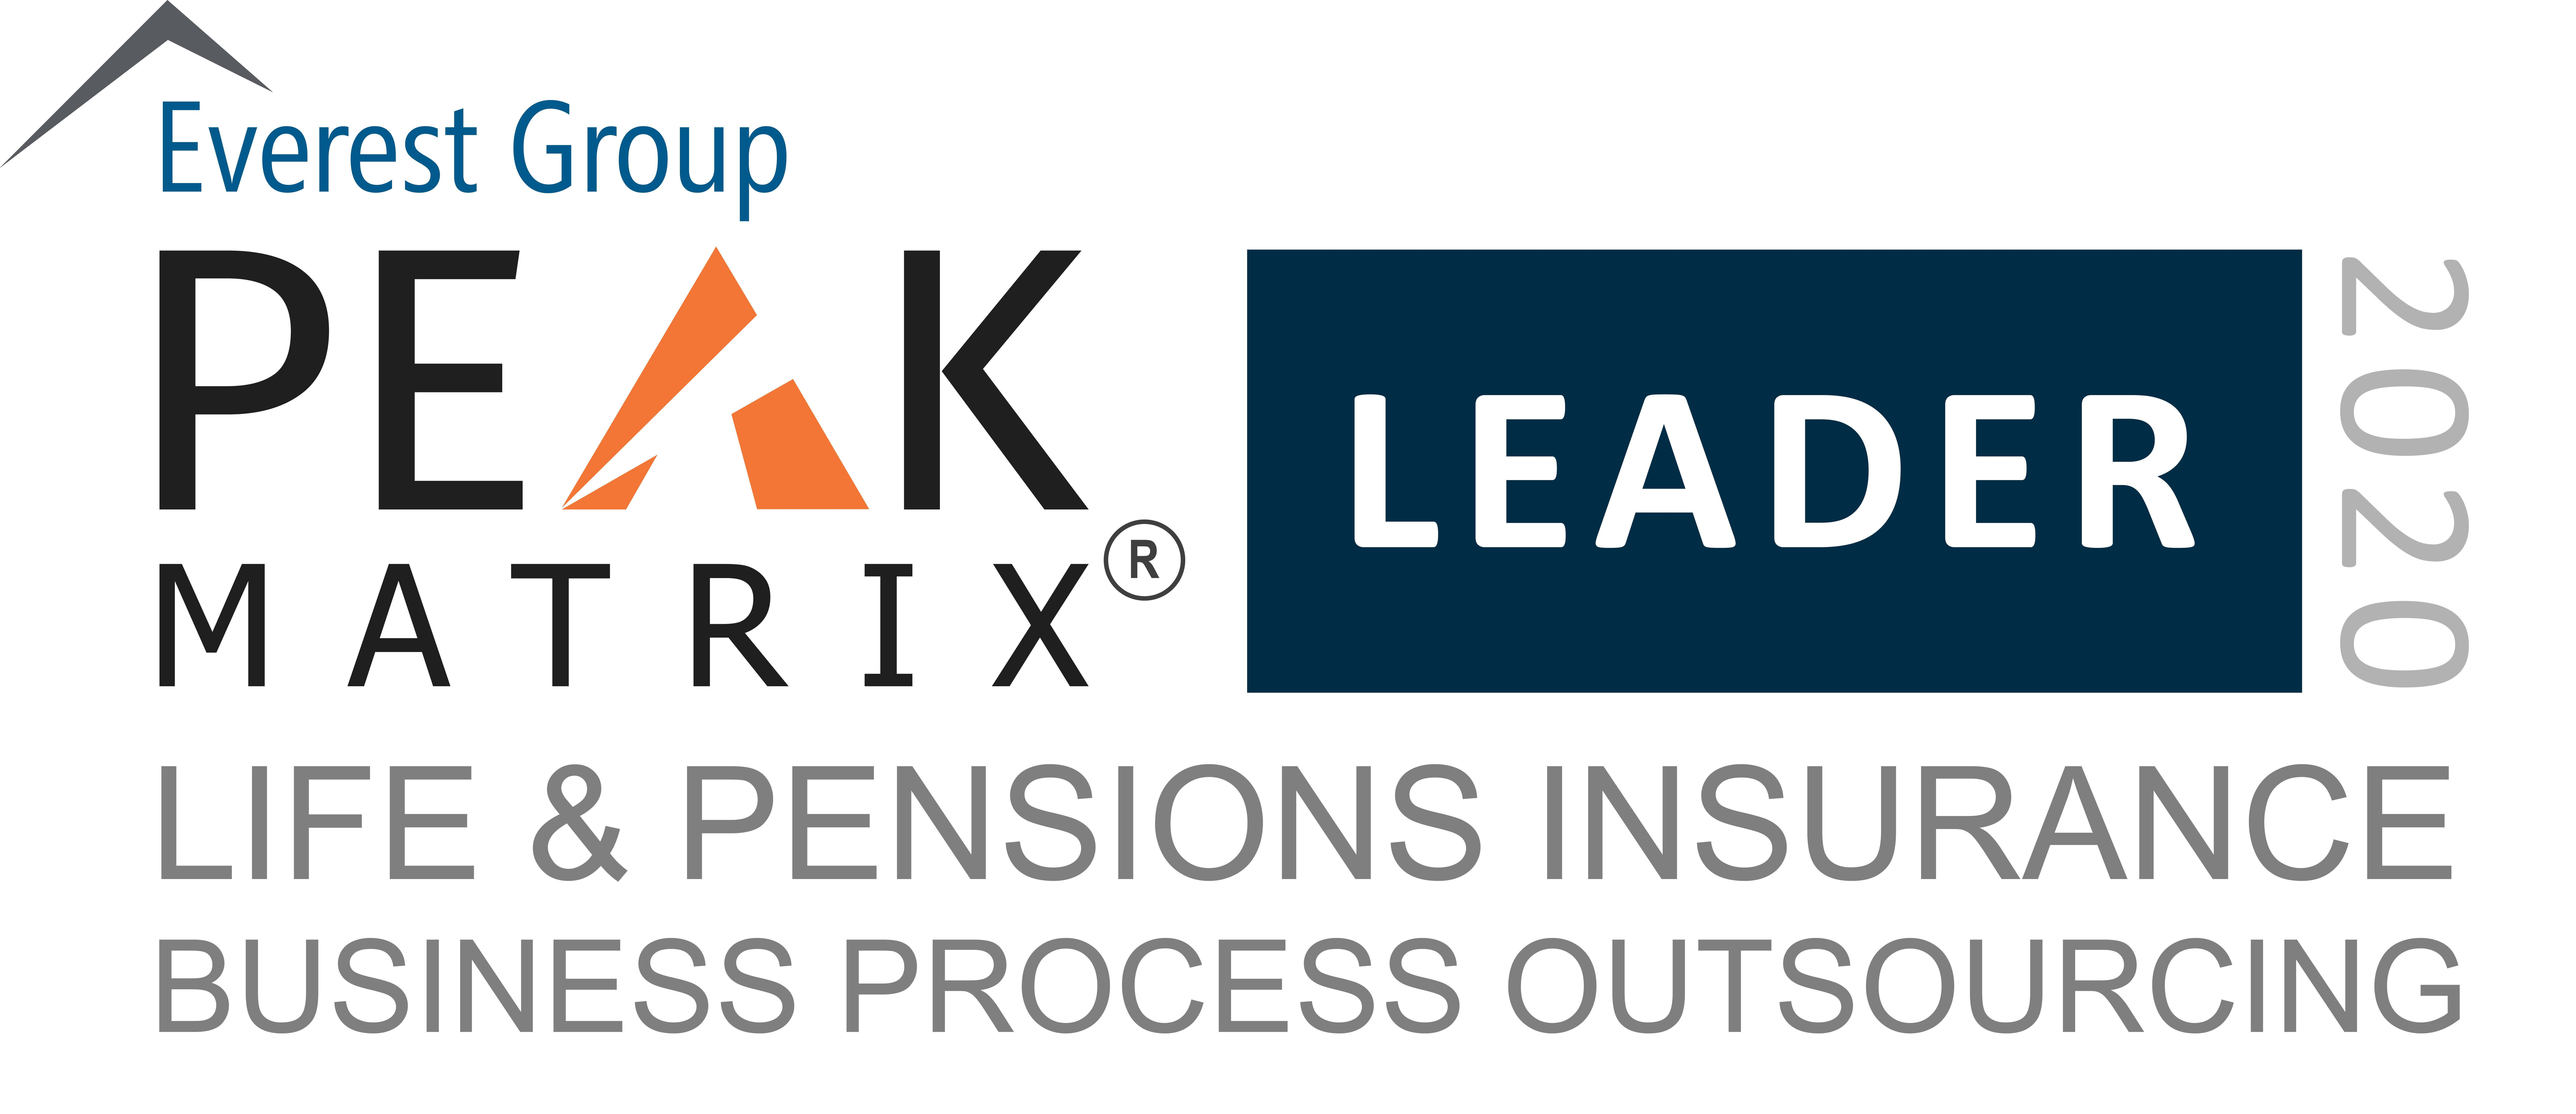 L&P Insurance BPO 2020 - PEAK Matrix Award Logo - Leader